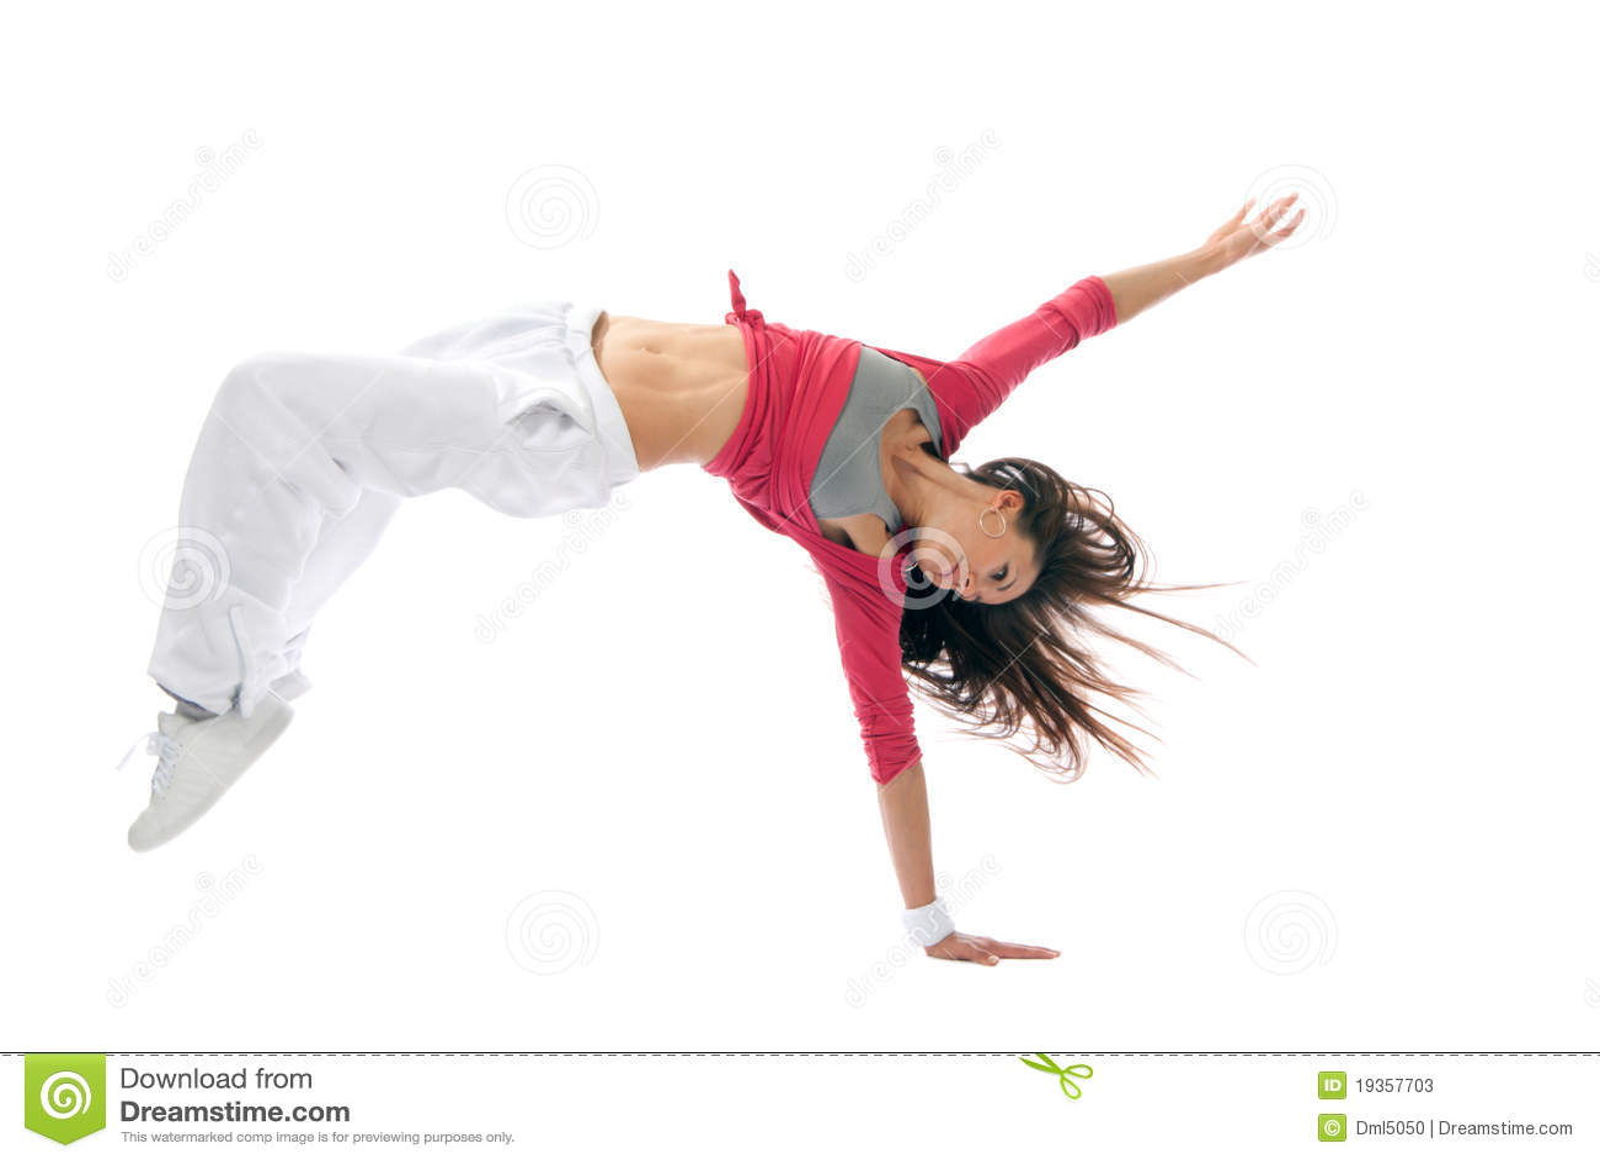 Danse de rupture moderne de danseuse de femme de type de hip-hop